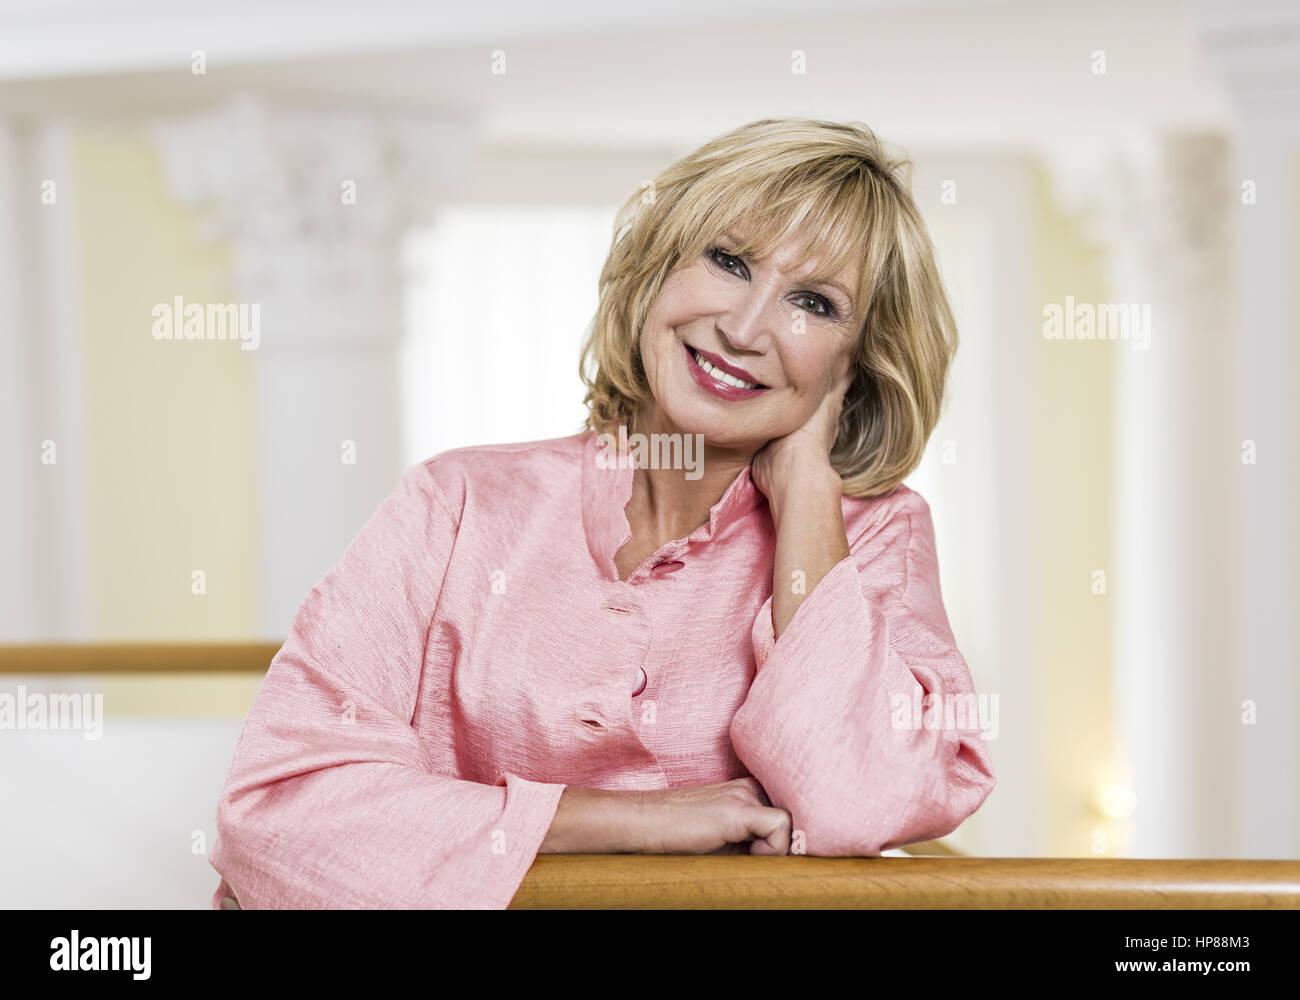 Blonde Frau in eleganter rosa Jacke (model-released) - Stock Image